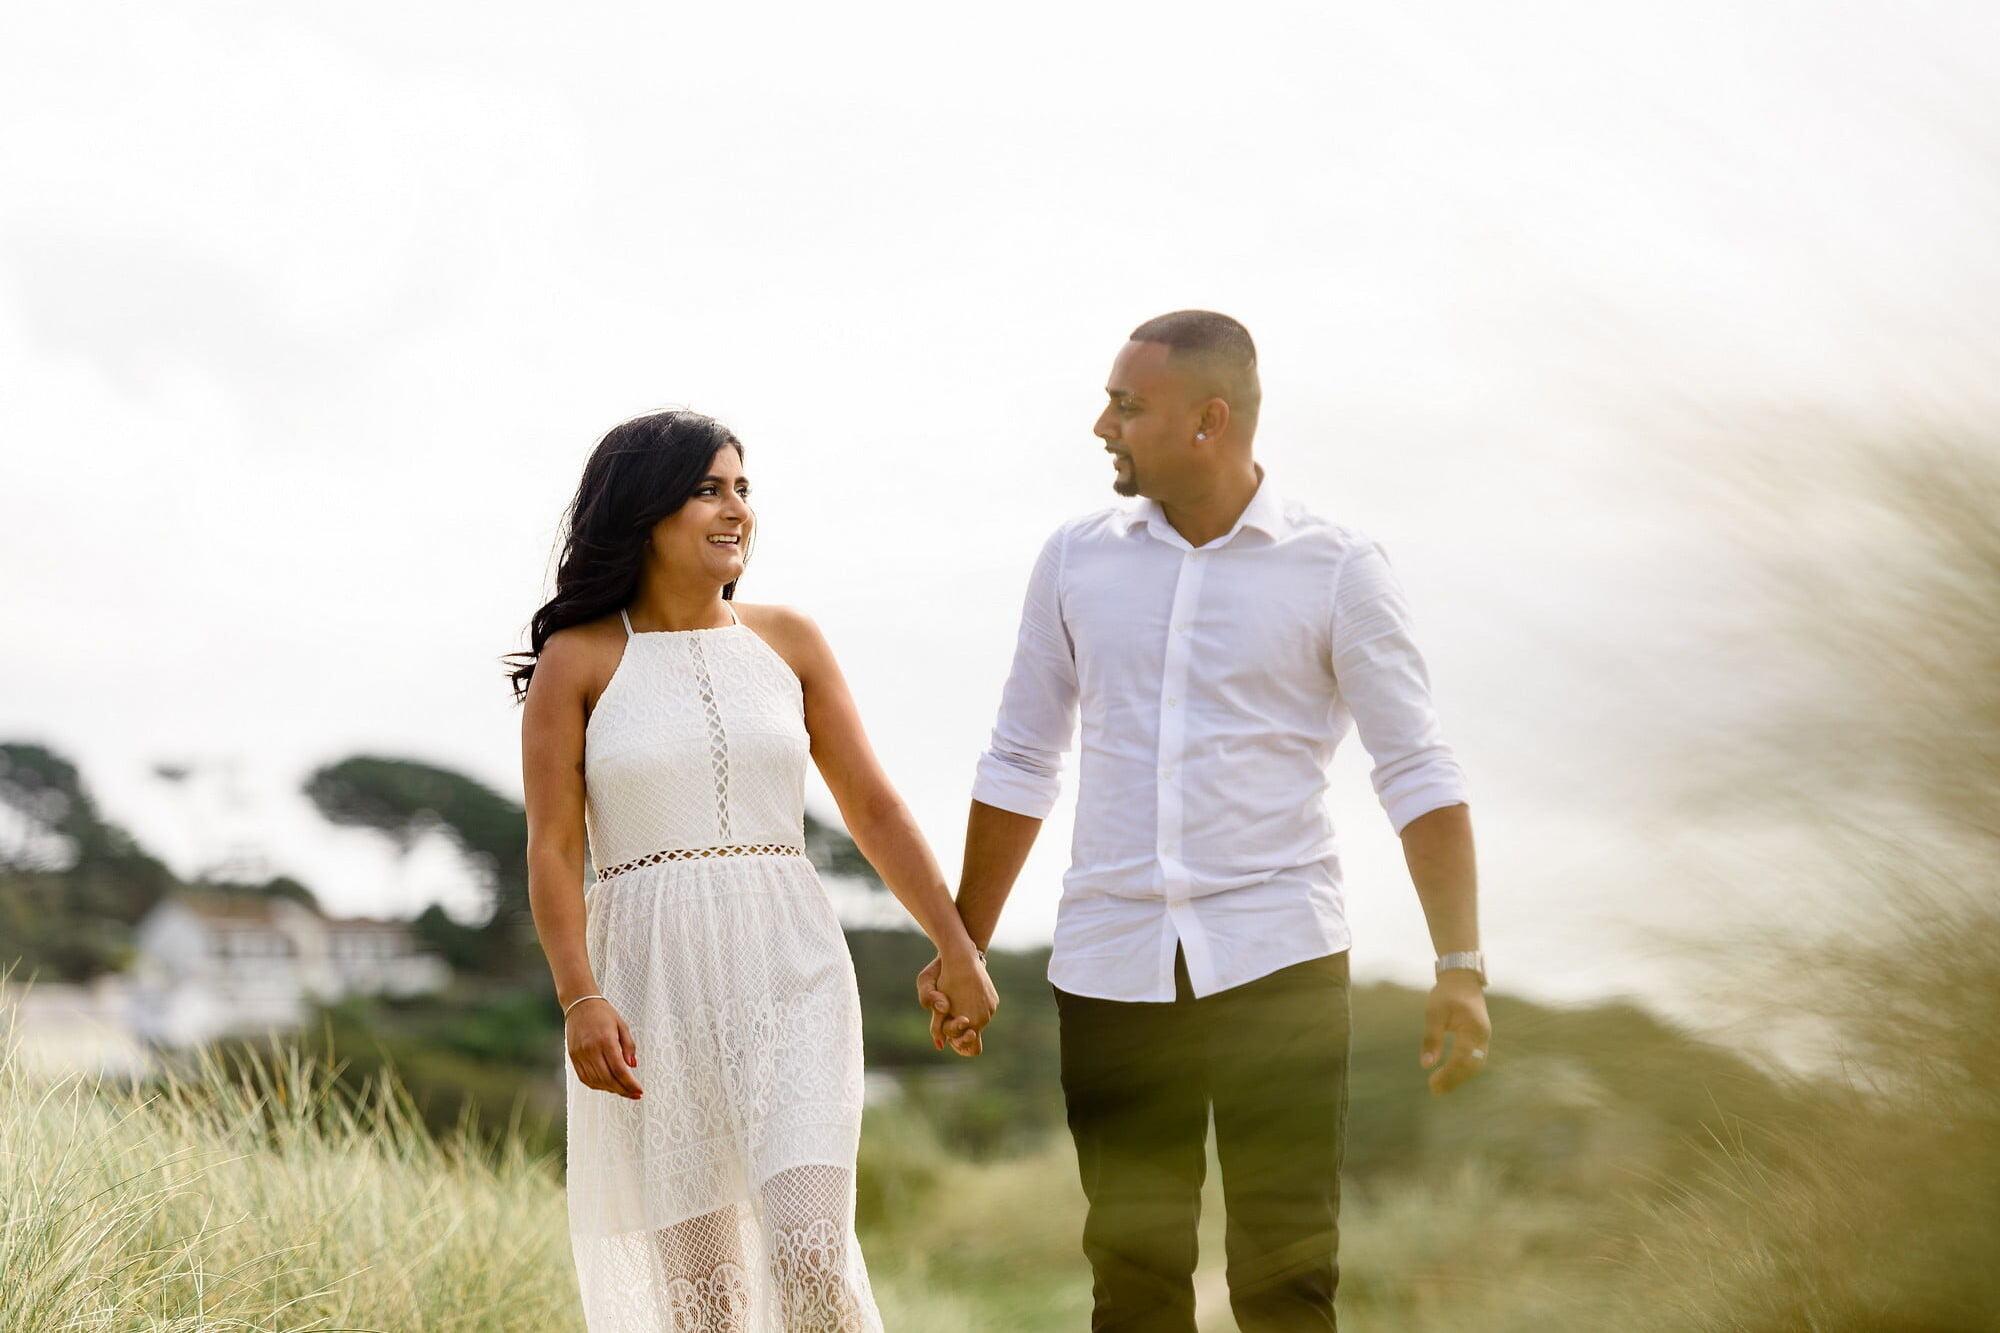 st-michaels-mount-wedding-proposal-6